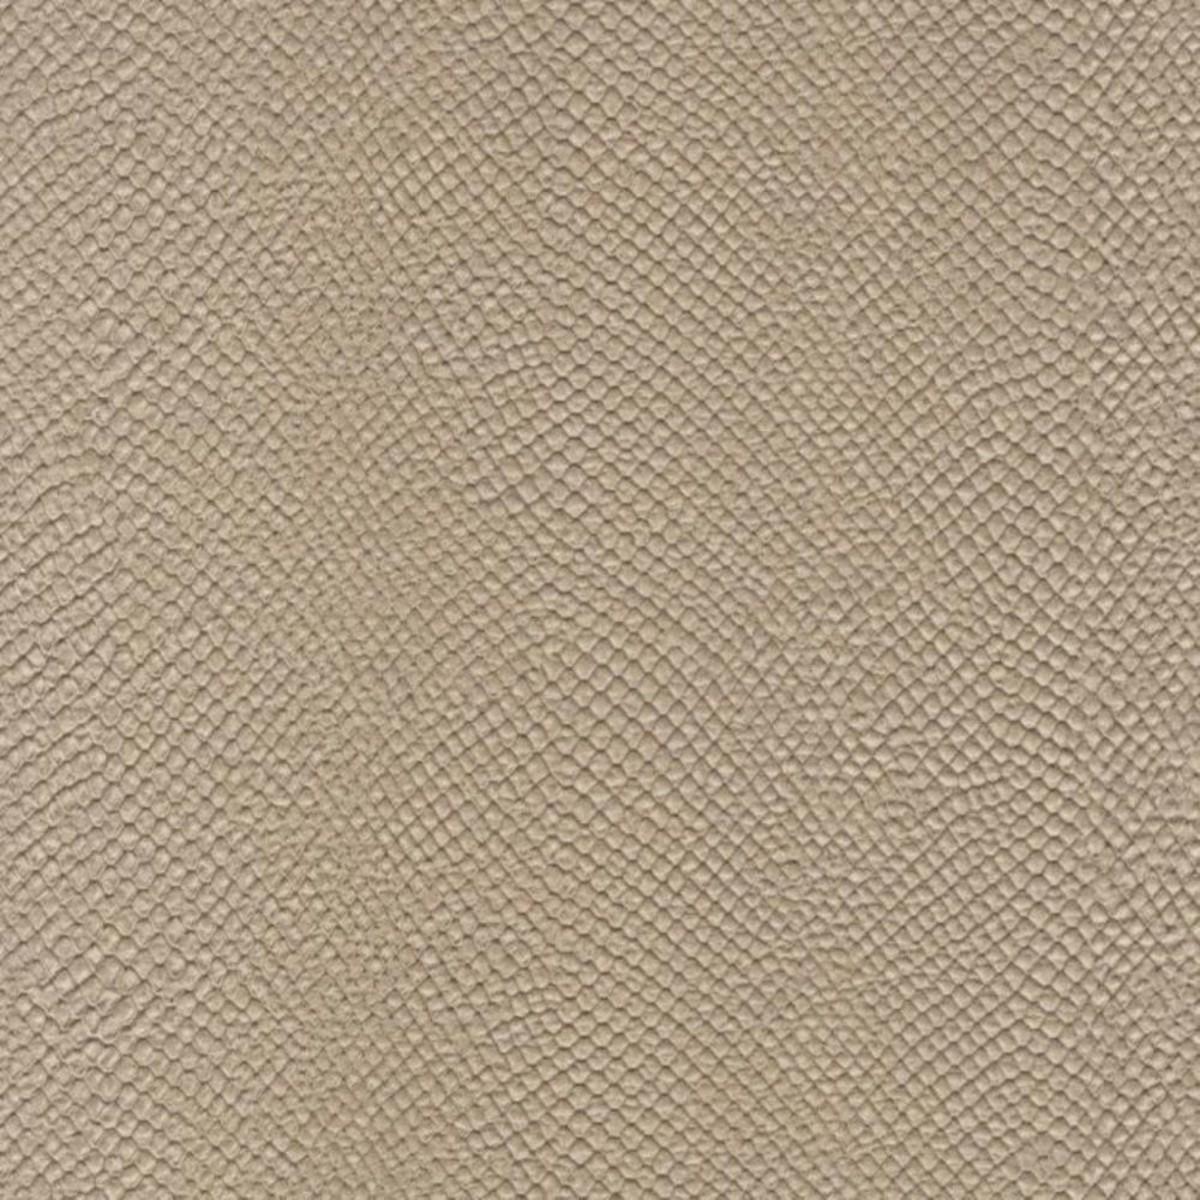 Виниловые обои Did коричневые SD102033 0.52 м